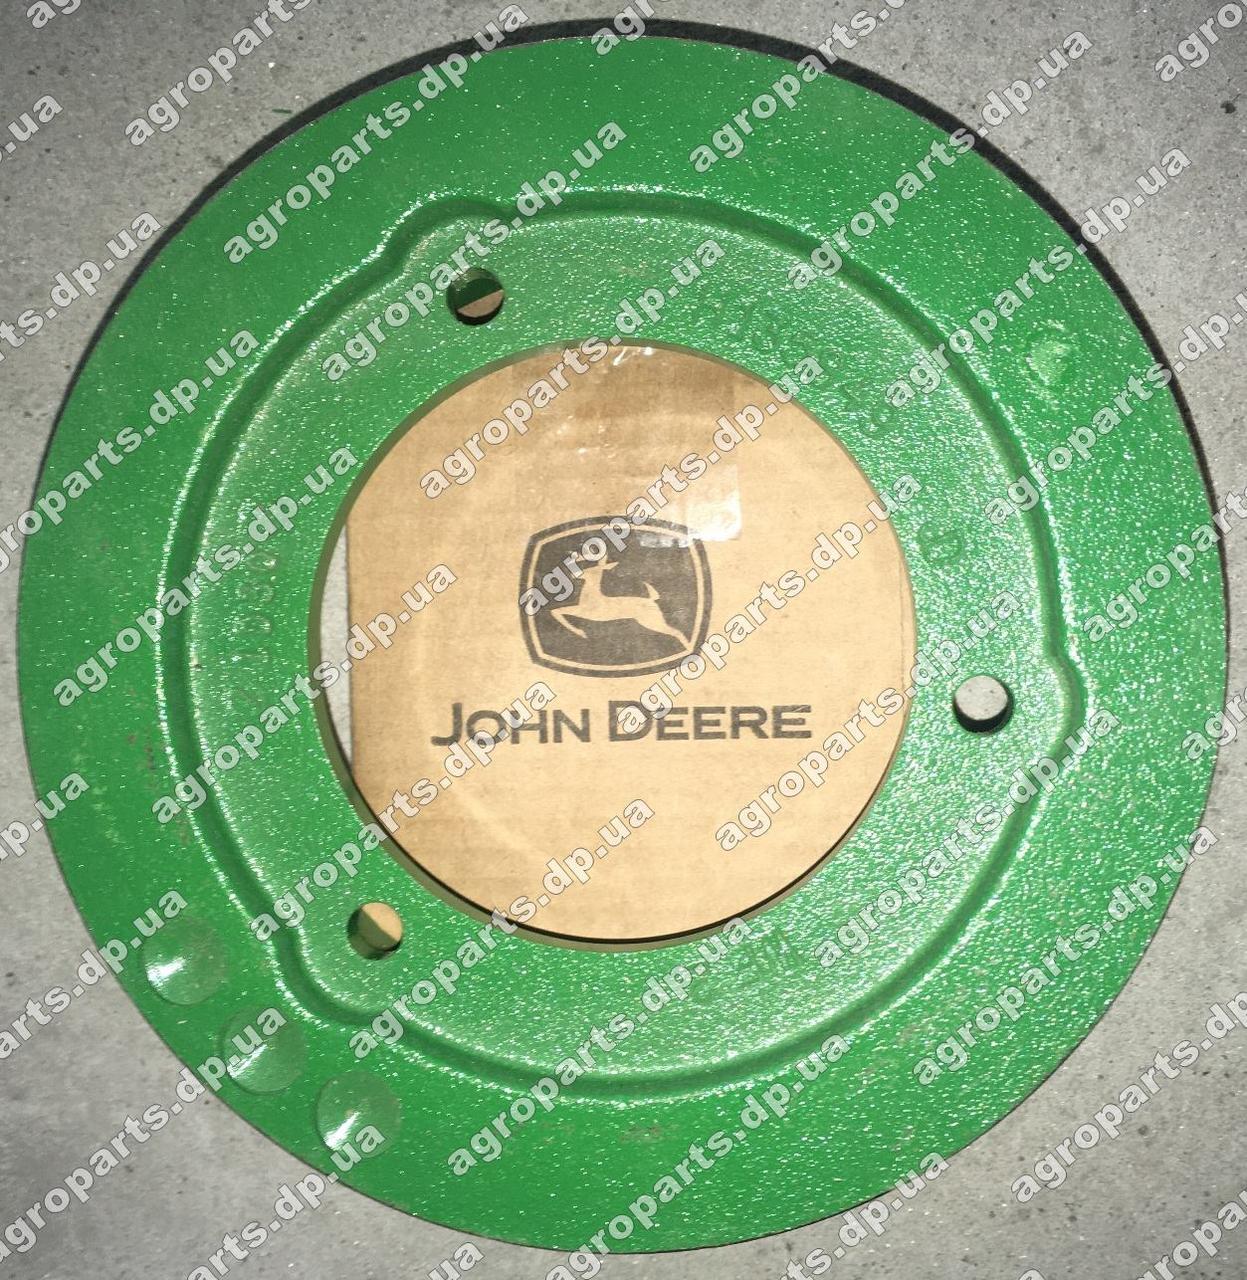 Шкив H135849 jd двух руч PULLEY John Deere SHEAVE-BEATER DRIVE, 217 EO запчасти Н135849